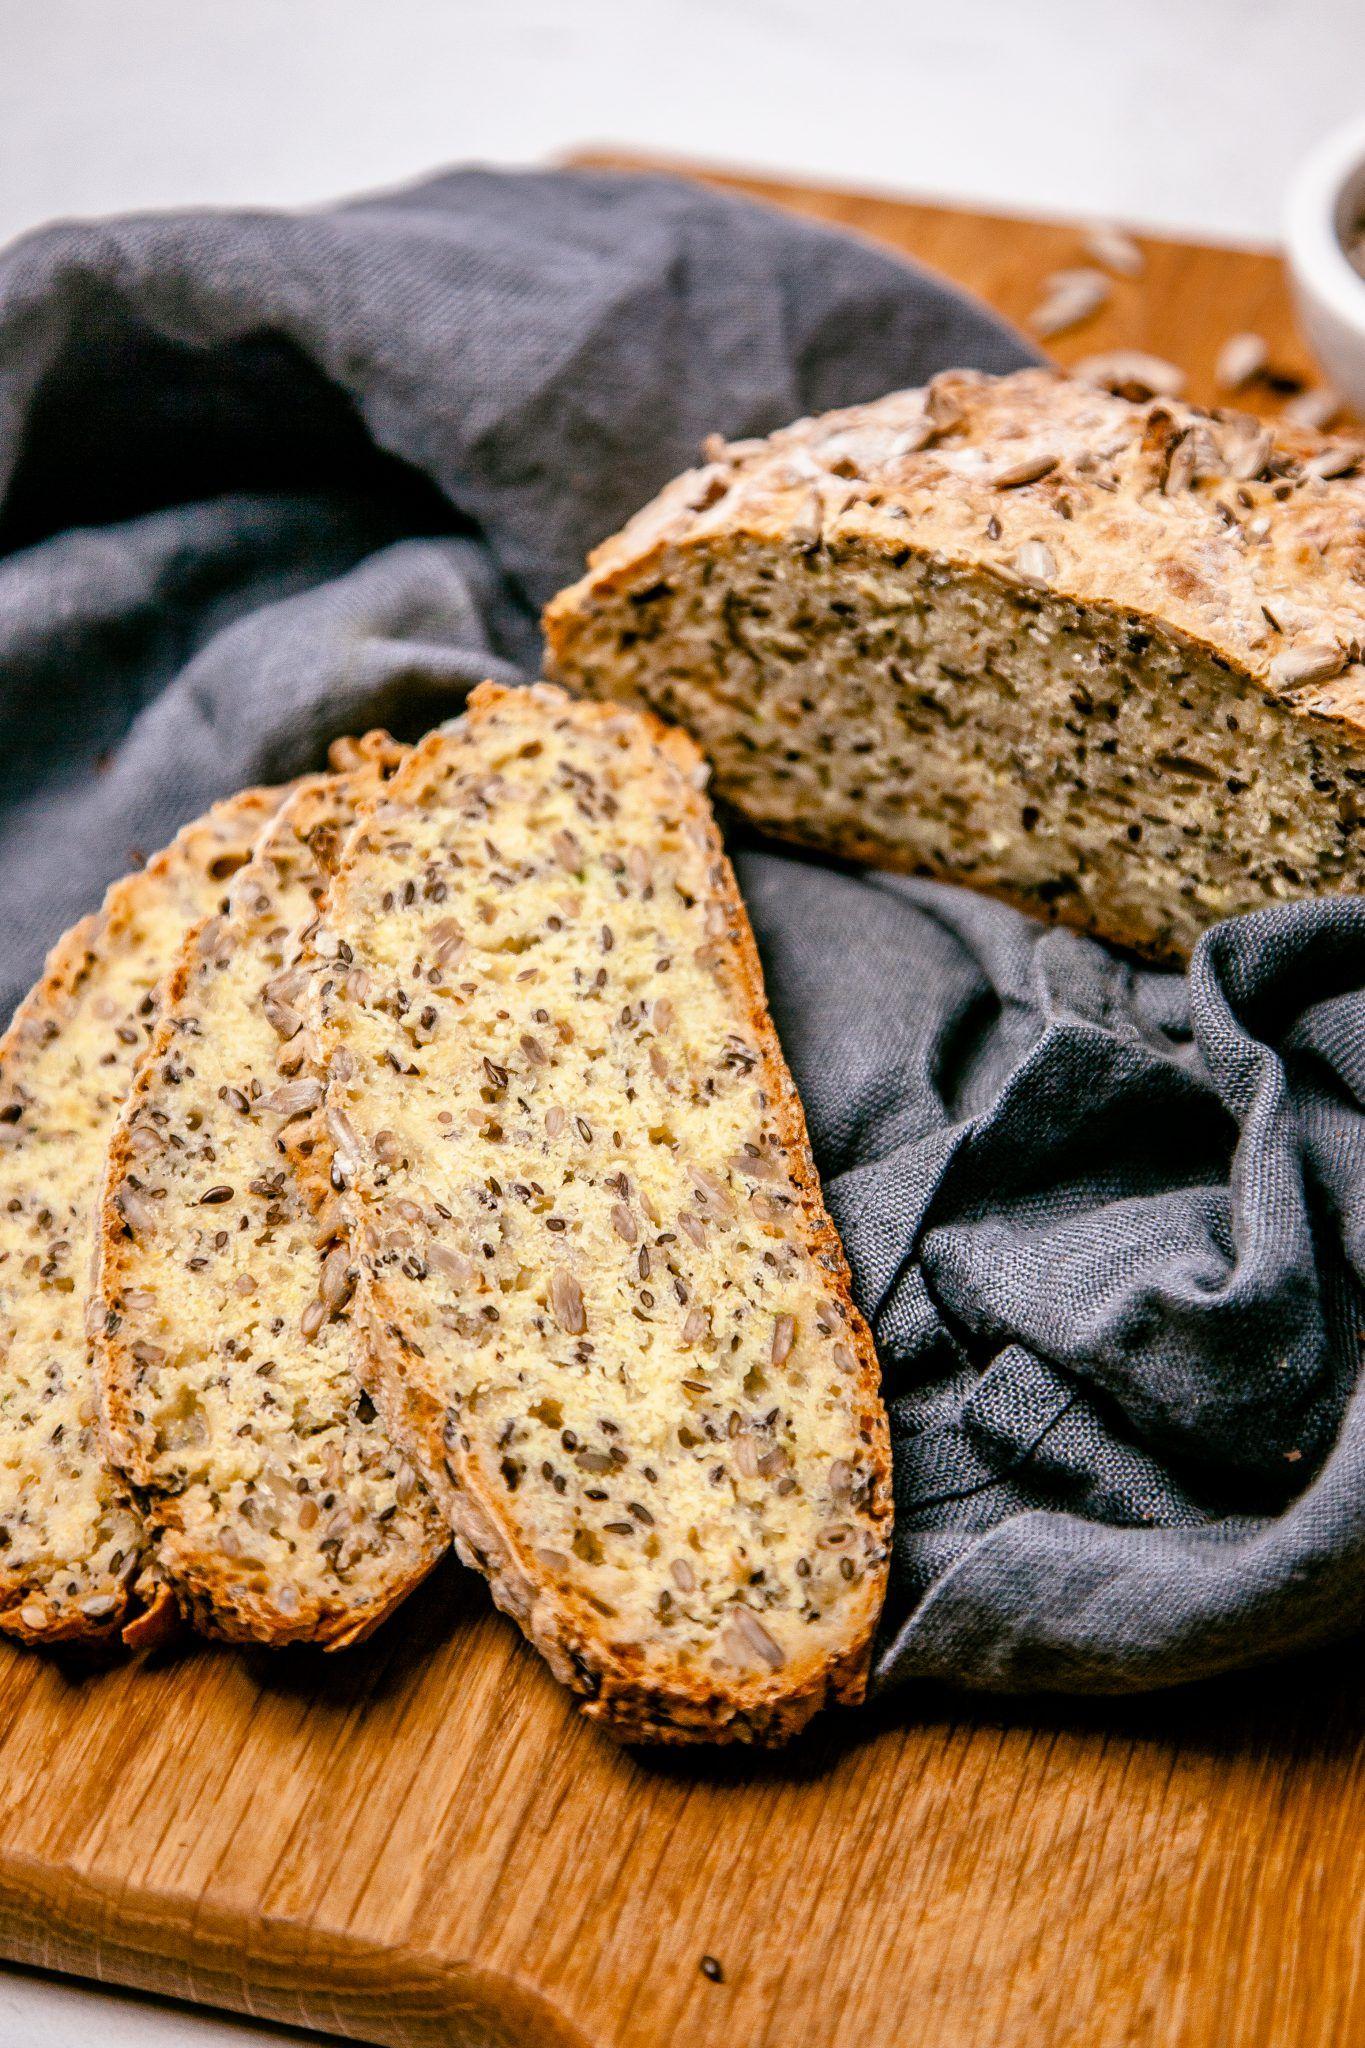 Recipe Easy No Yeast Buttermilk Bread Beastfeast Recipe In 2020 Buttermilk Bread Homemade Bread Bread